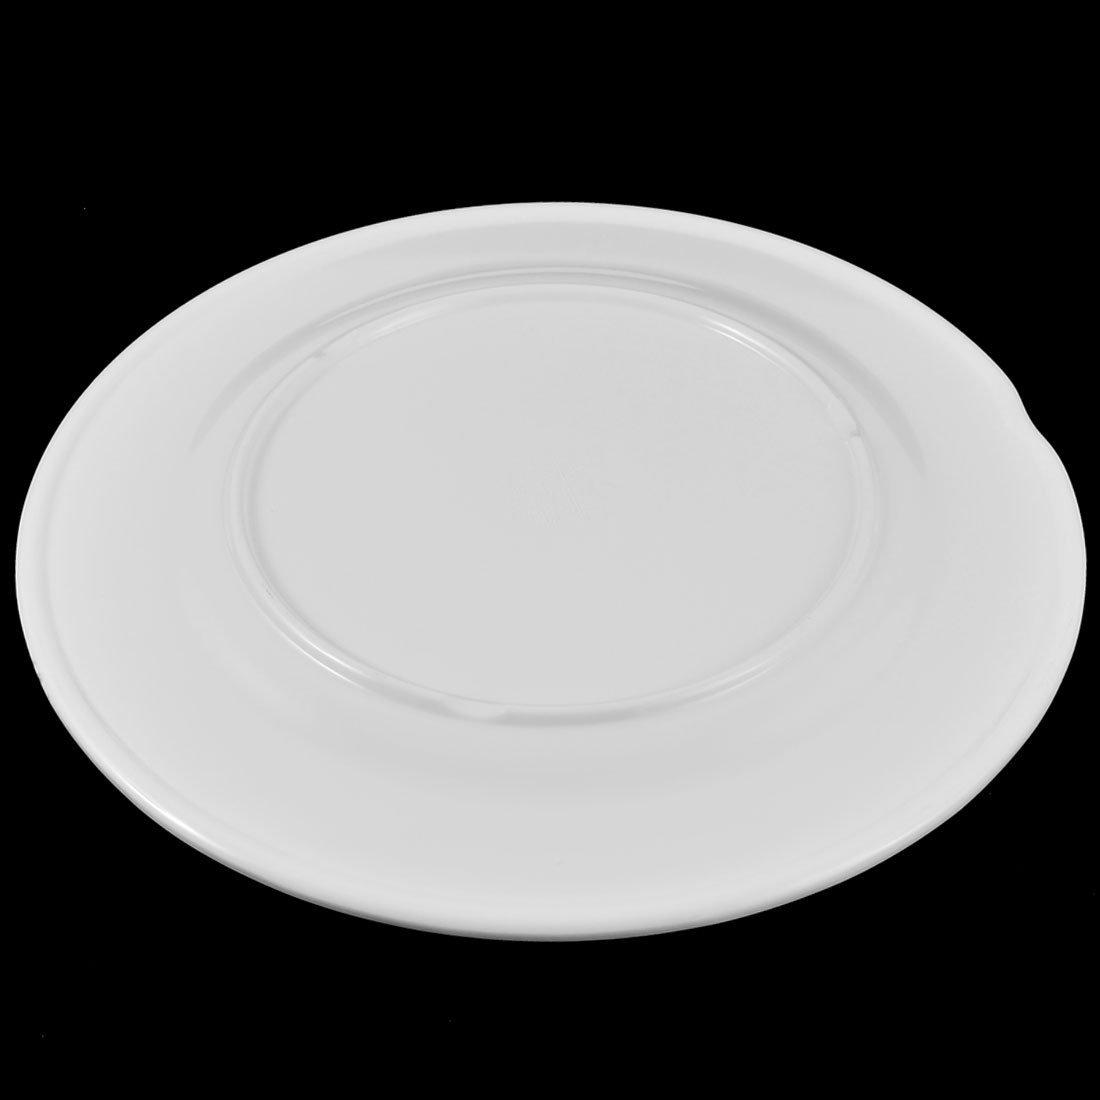 Amazon.com: DealMux Plastic forma redonda Fruta Doce placa prato 22, 5 centímetros Bandeja Container: Kitchen & Dining